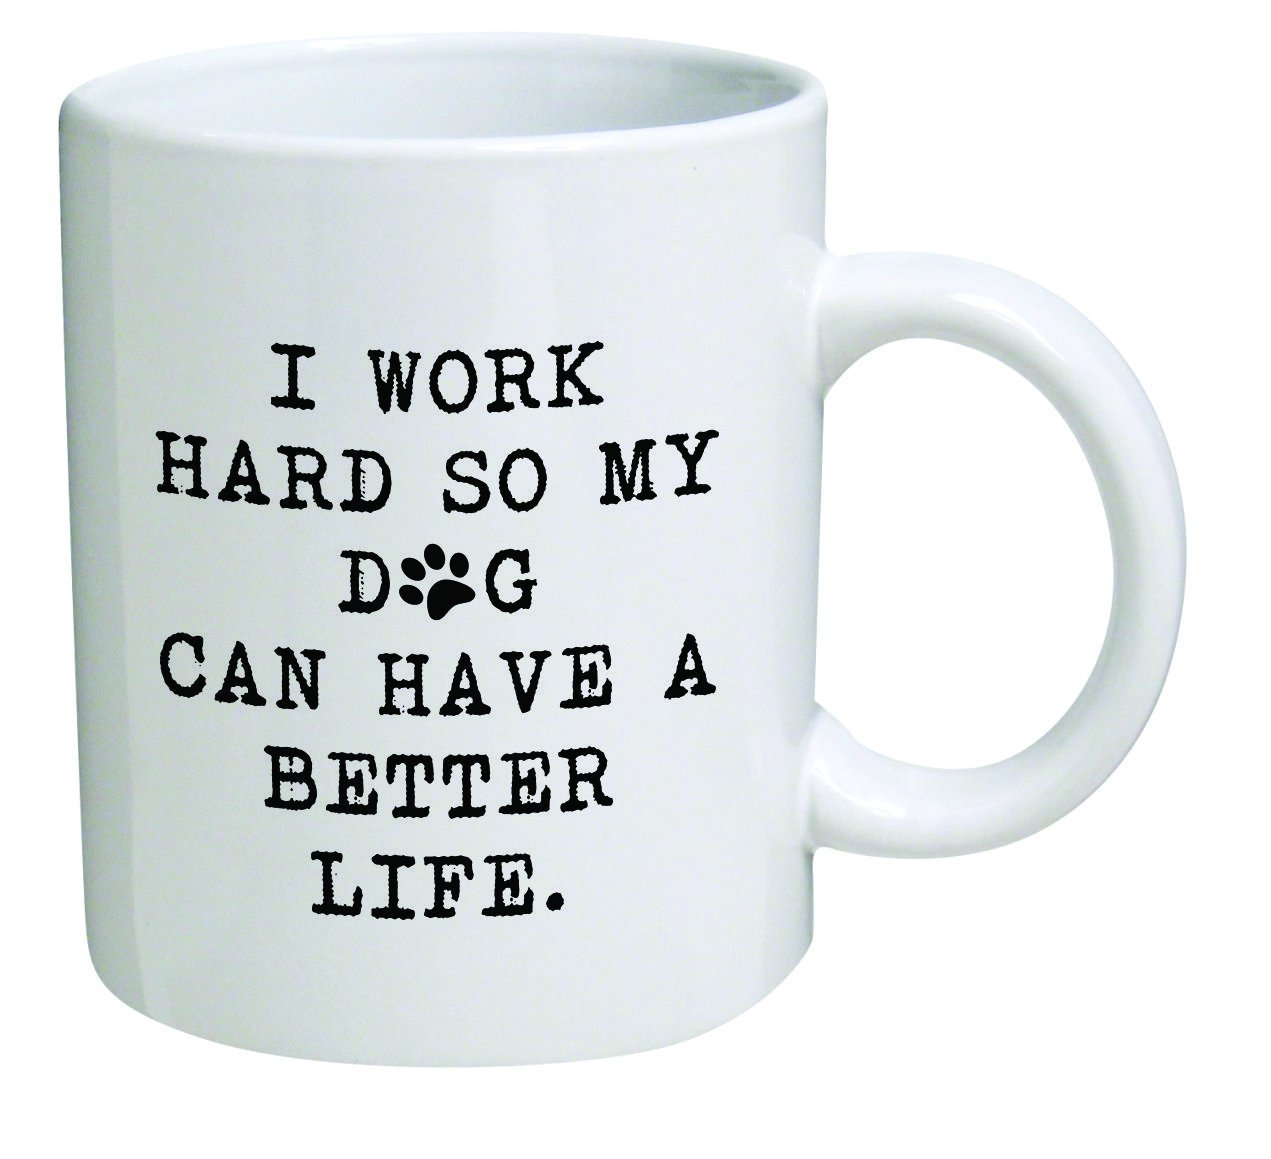 A dog mug for any animal lover -Weird but actually smart Christmas gifts for guys - Todaywedate.com